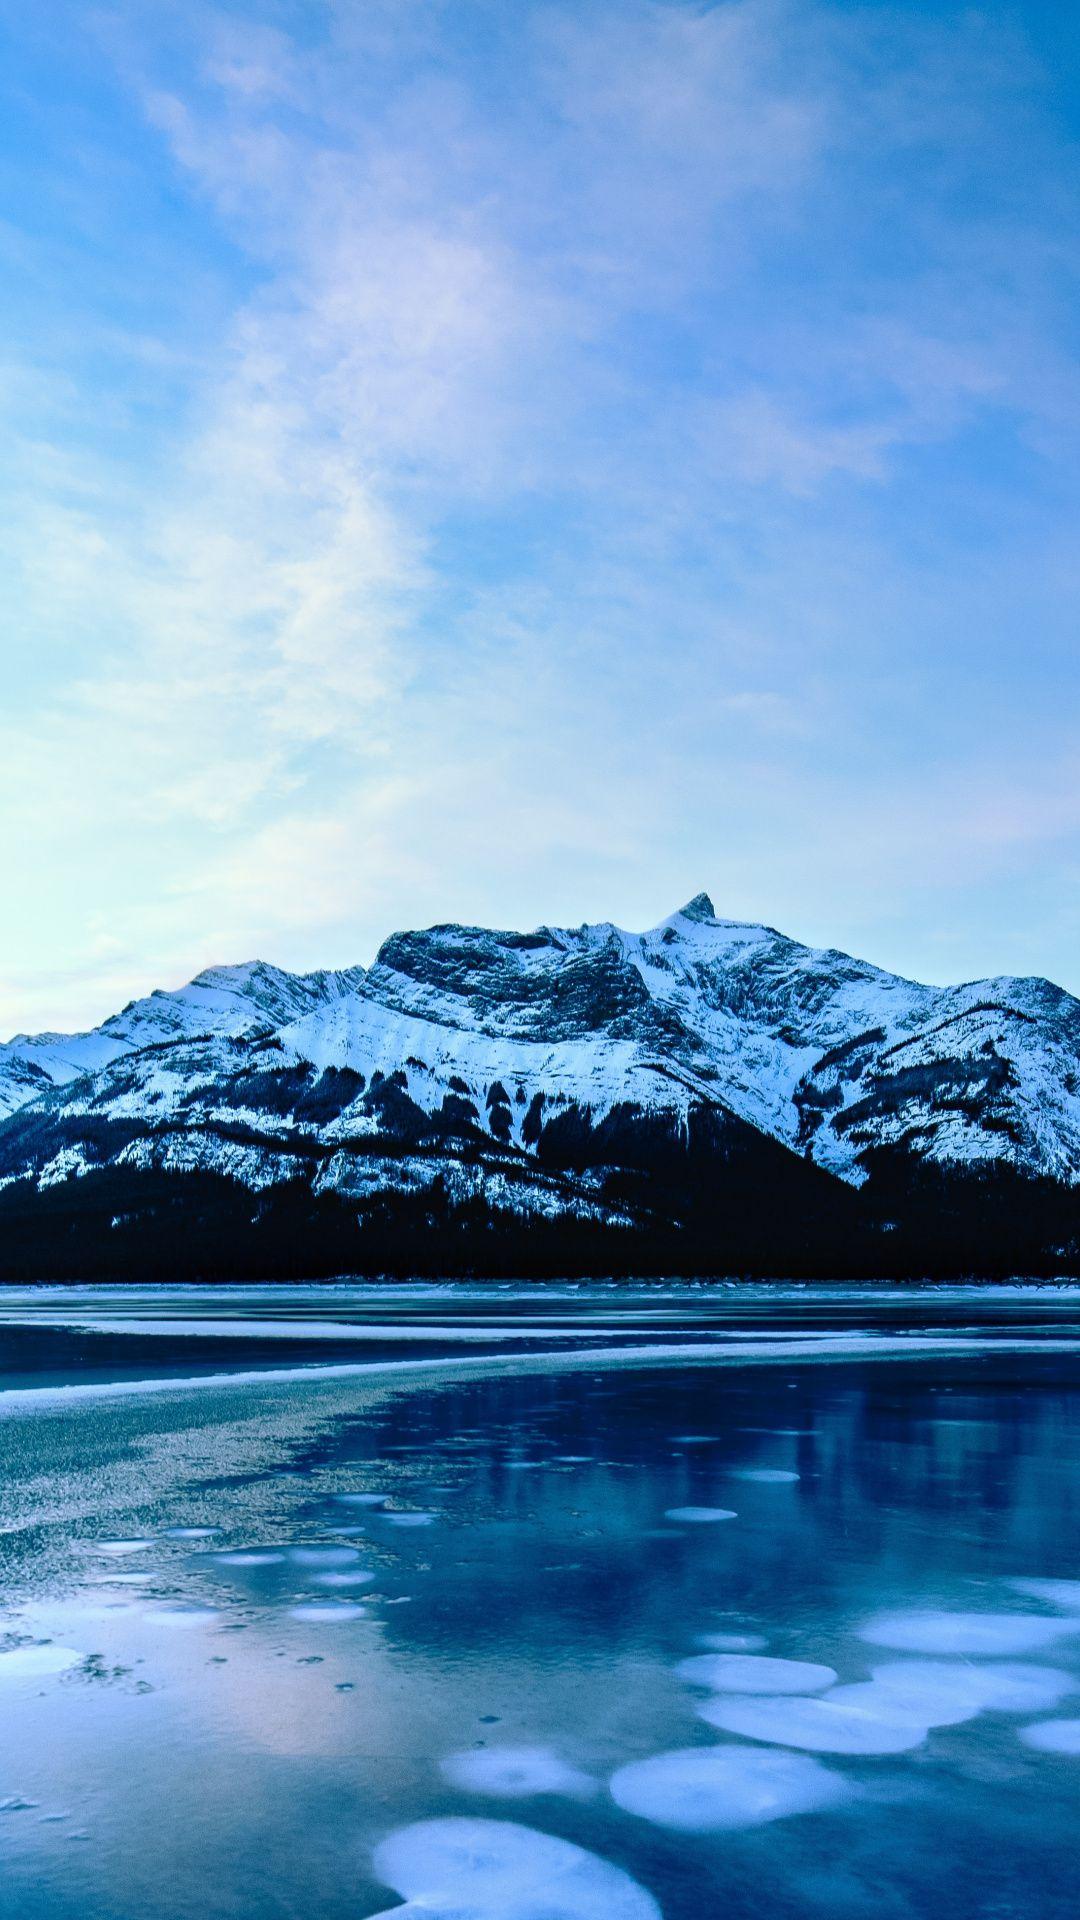 1080x1920 Blue Lake Mountains Wallpaper In 2020 Blue Lake Mountain Wallpaper Mountains